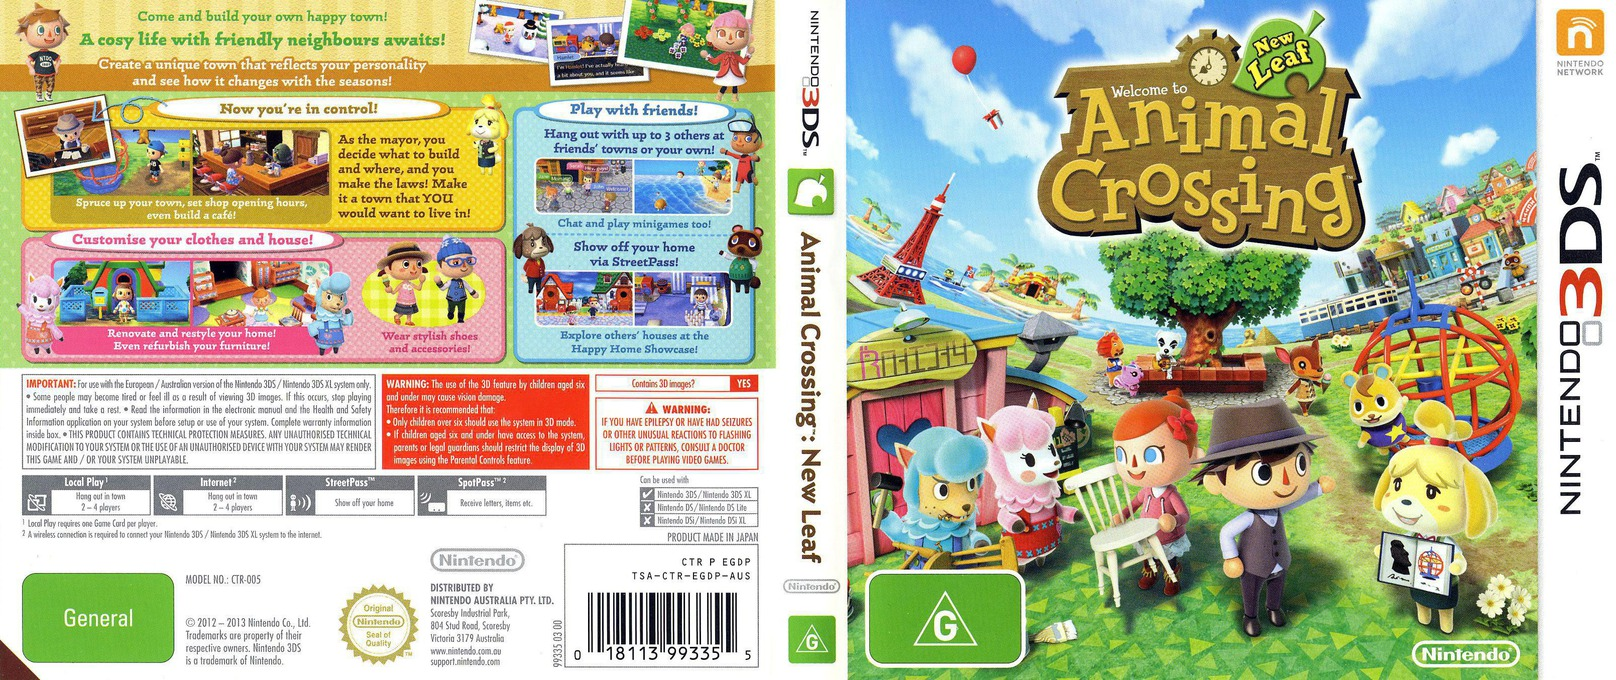 Animal Crossing - New Leaf 3DS coverfullHQ (EGDP)